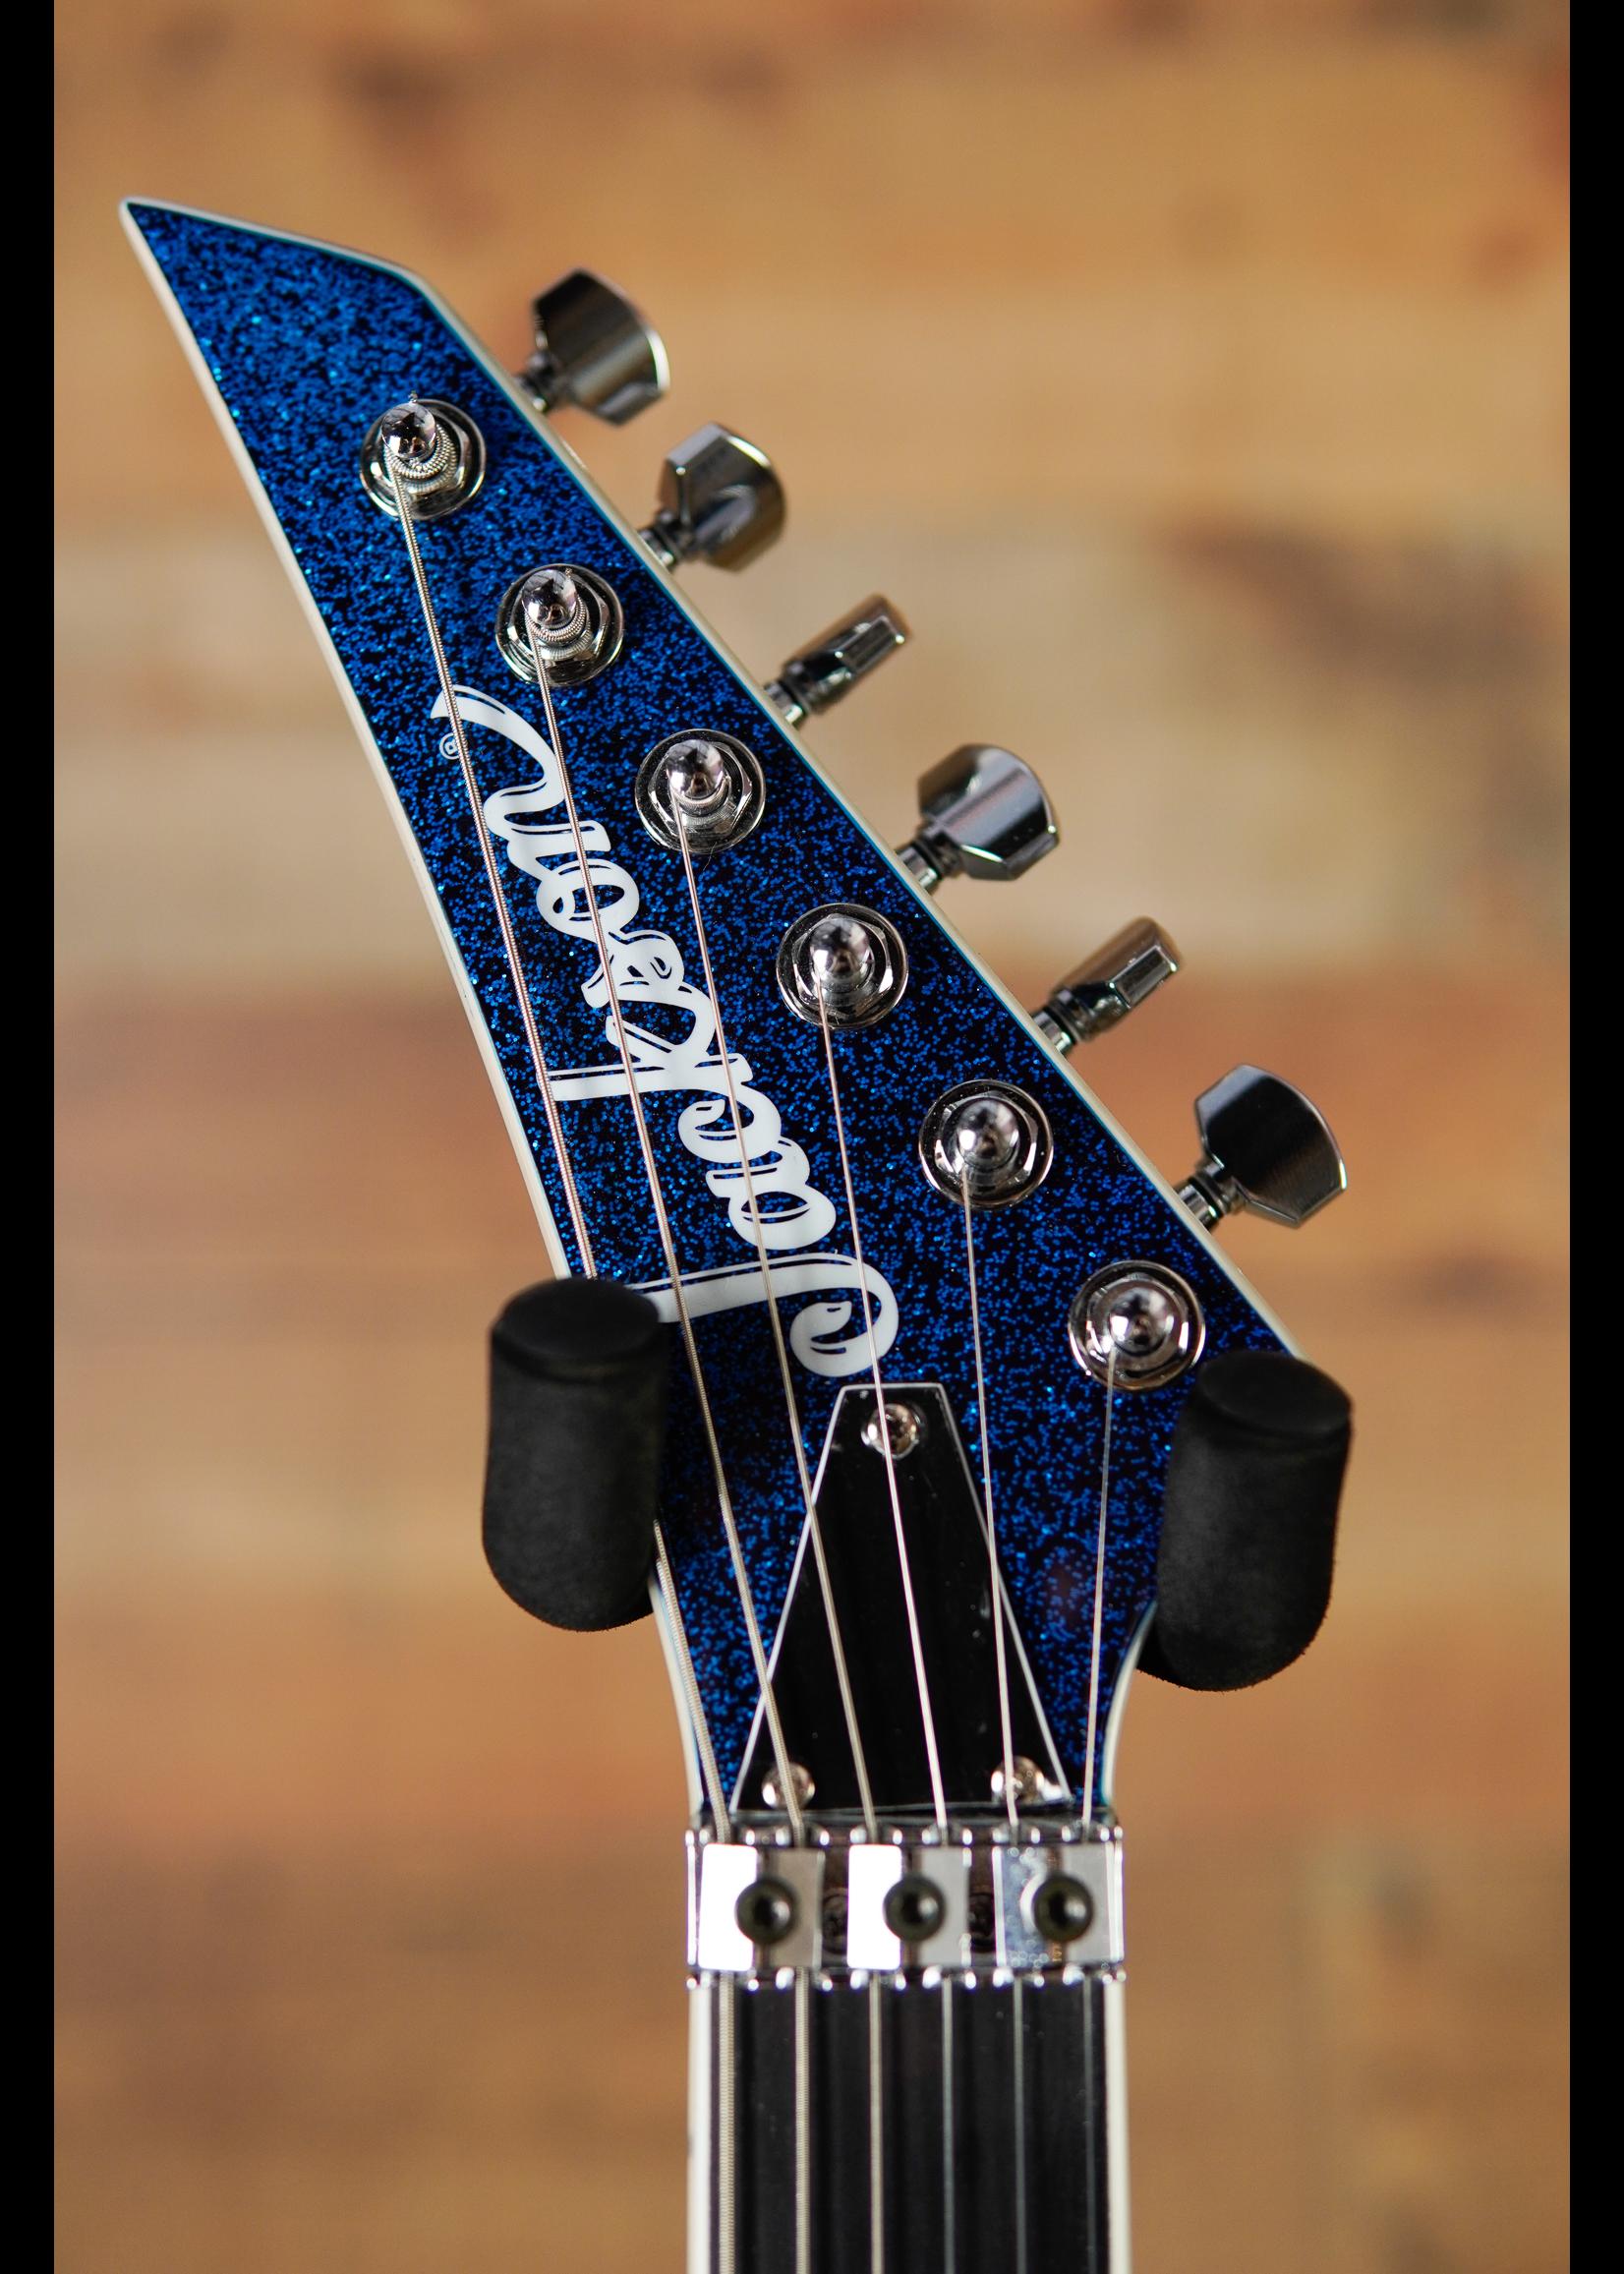 Jackson Jackson   Limited Edition Wildcard Series Soloist™ Arch Top Extreme SL27 EX, Ebony Fingerboard Blue